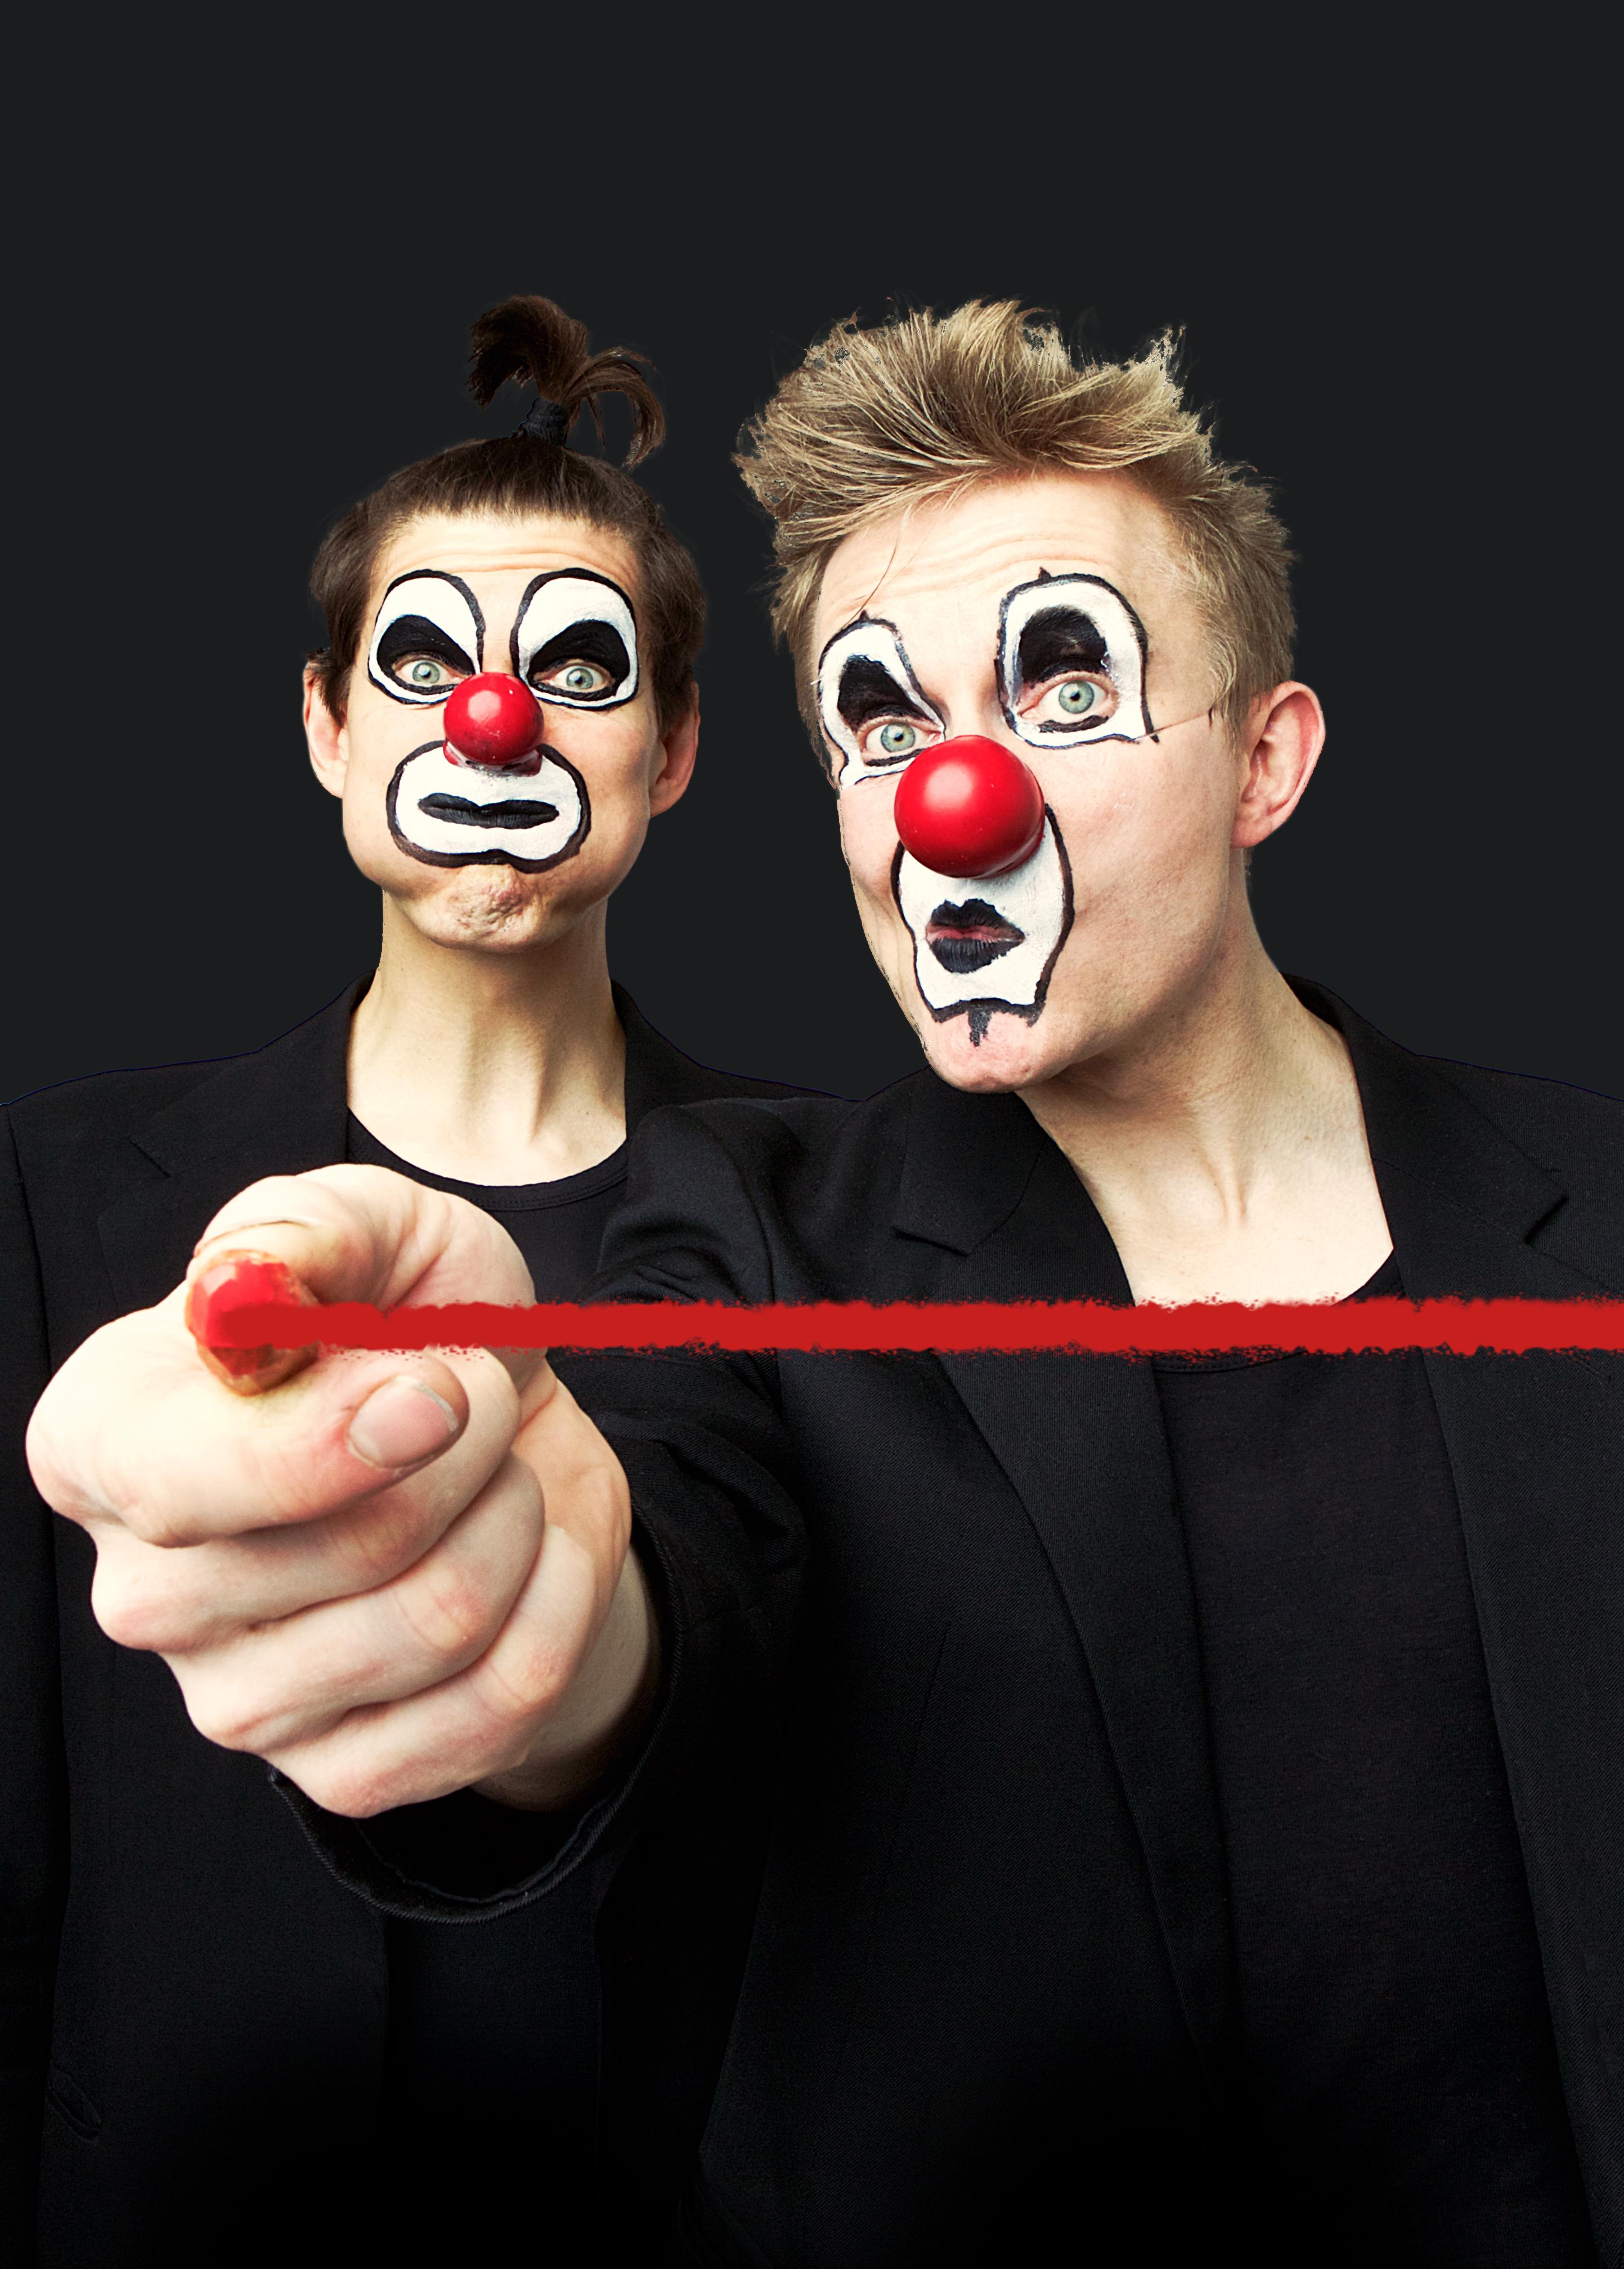 Red Nose Companyn Punainen viiva Maunula-talolla